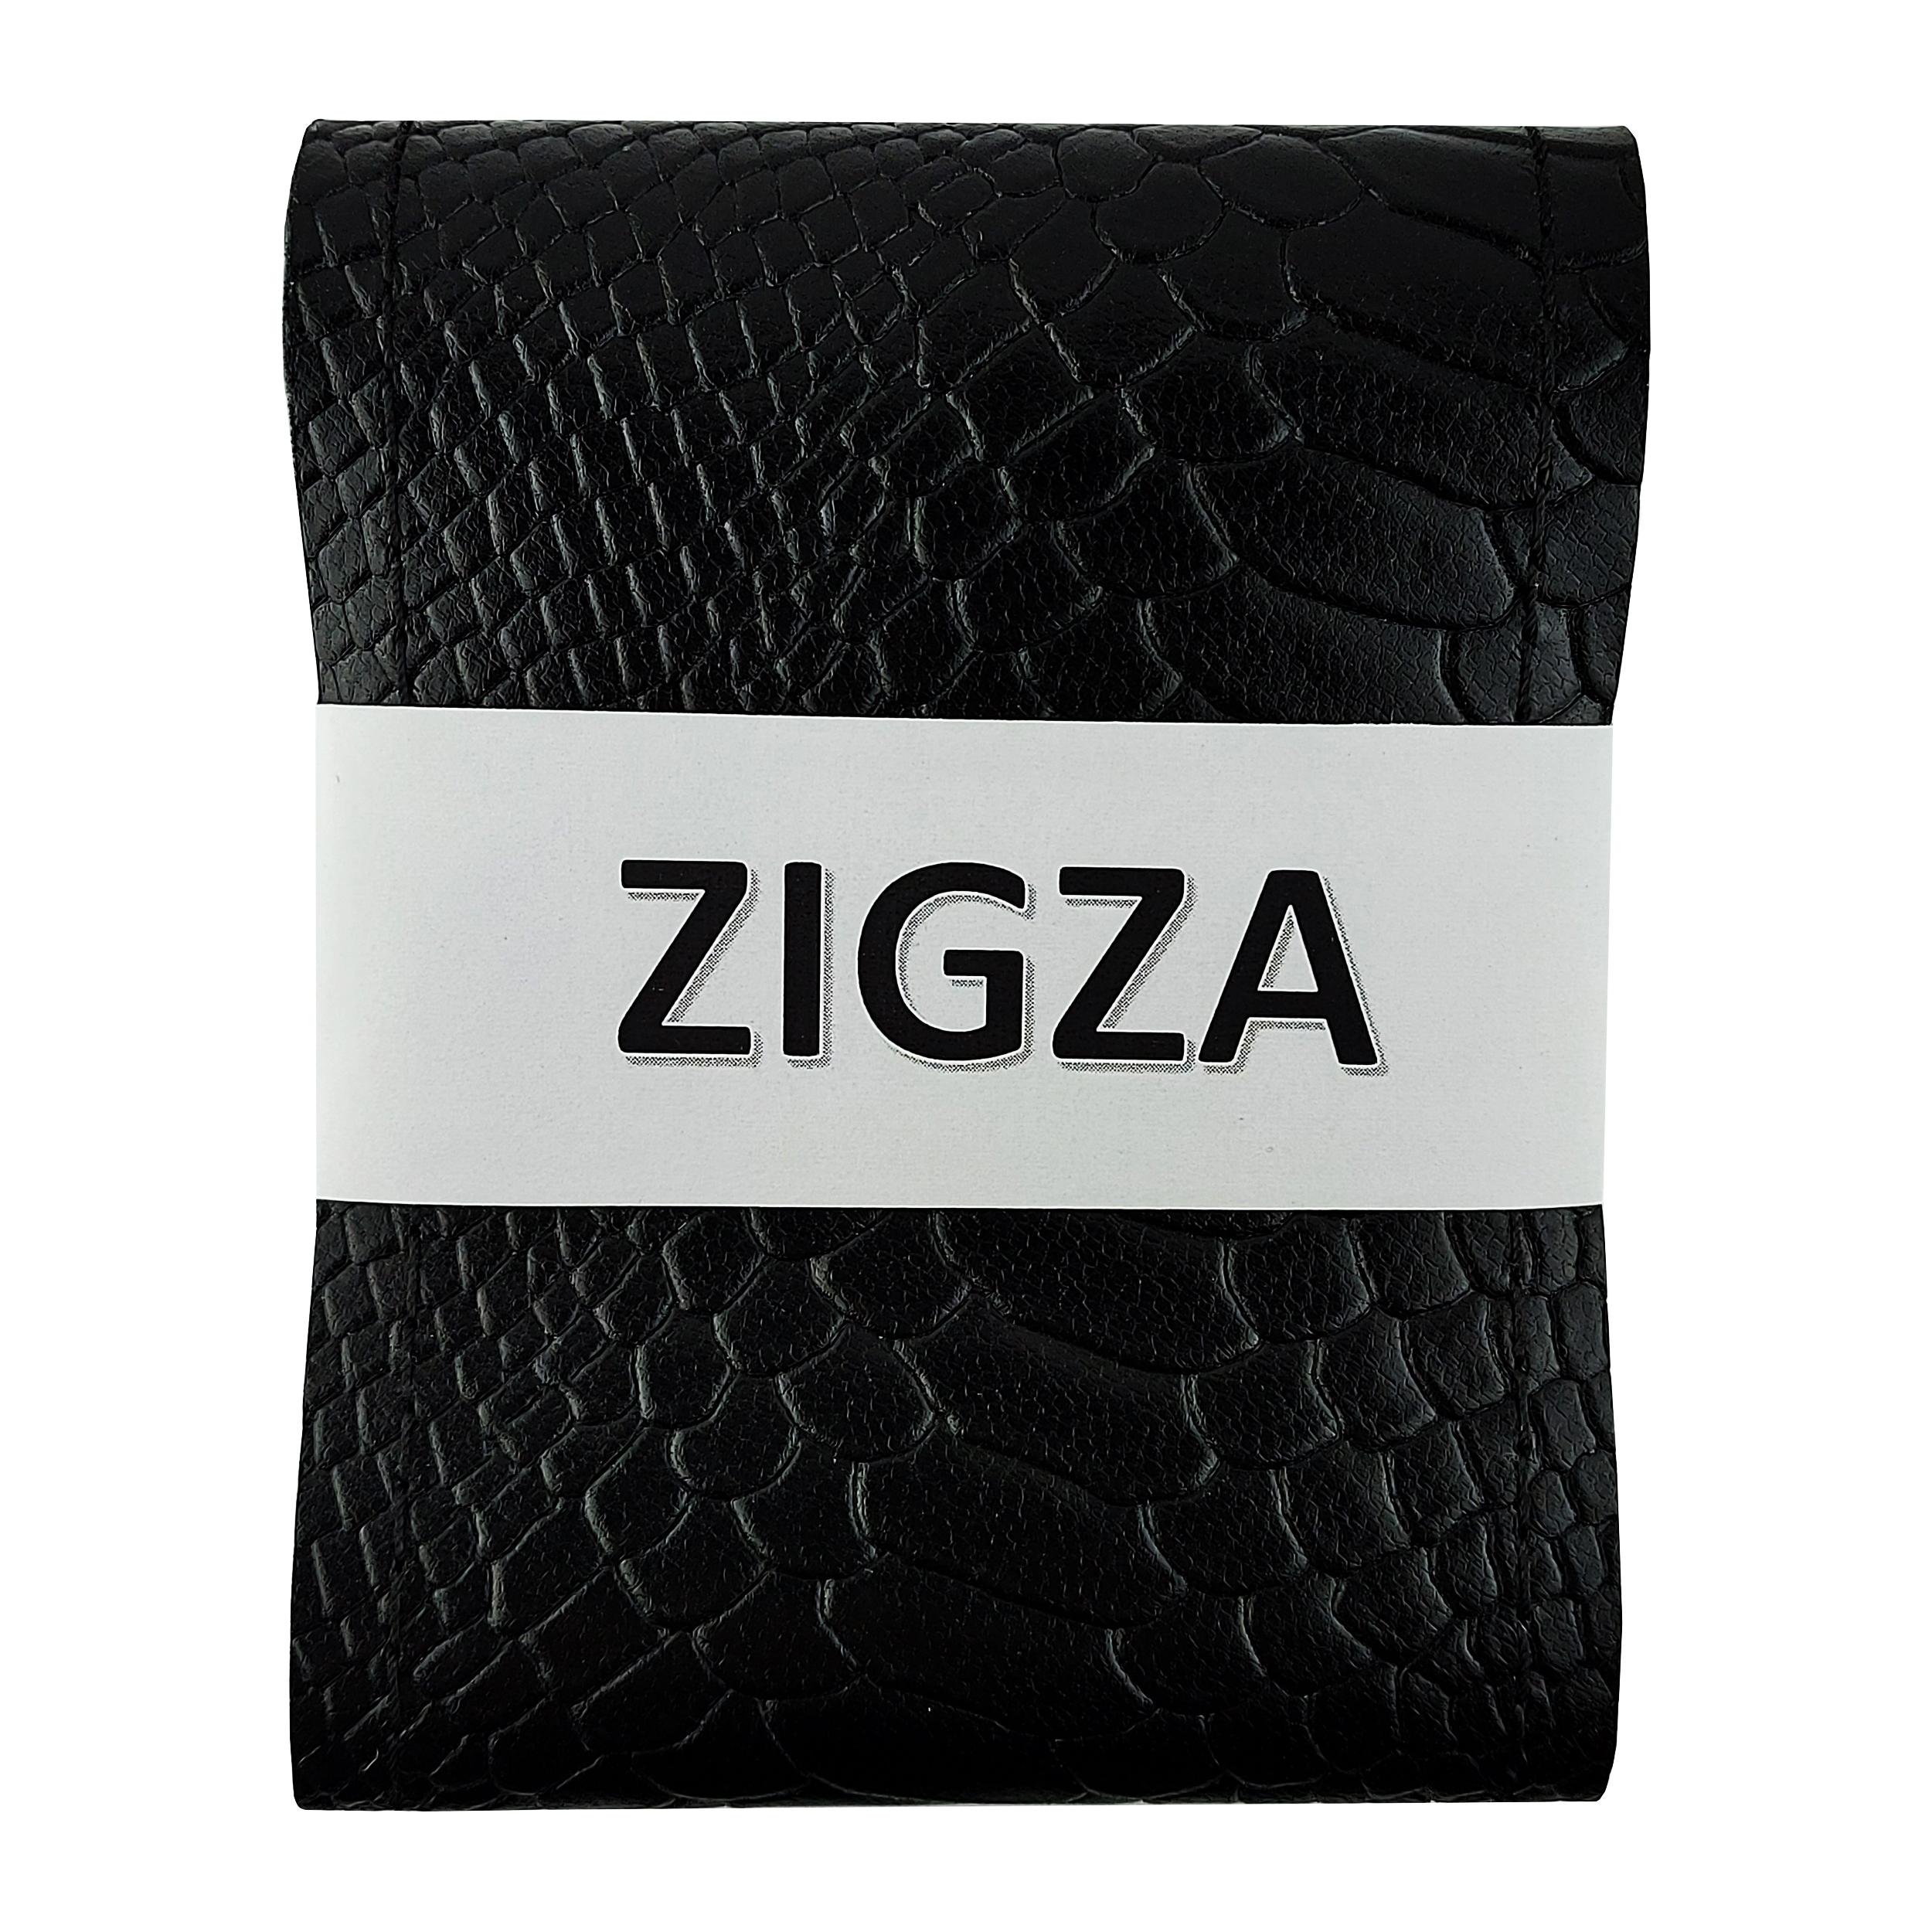 روکش فرمان زیگزا مدل z700